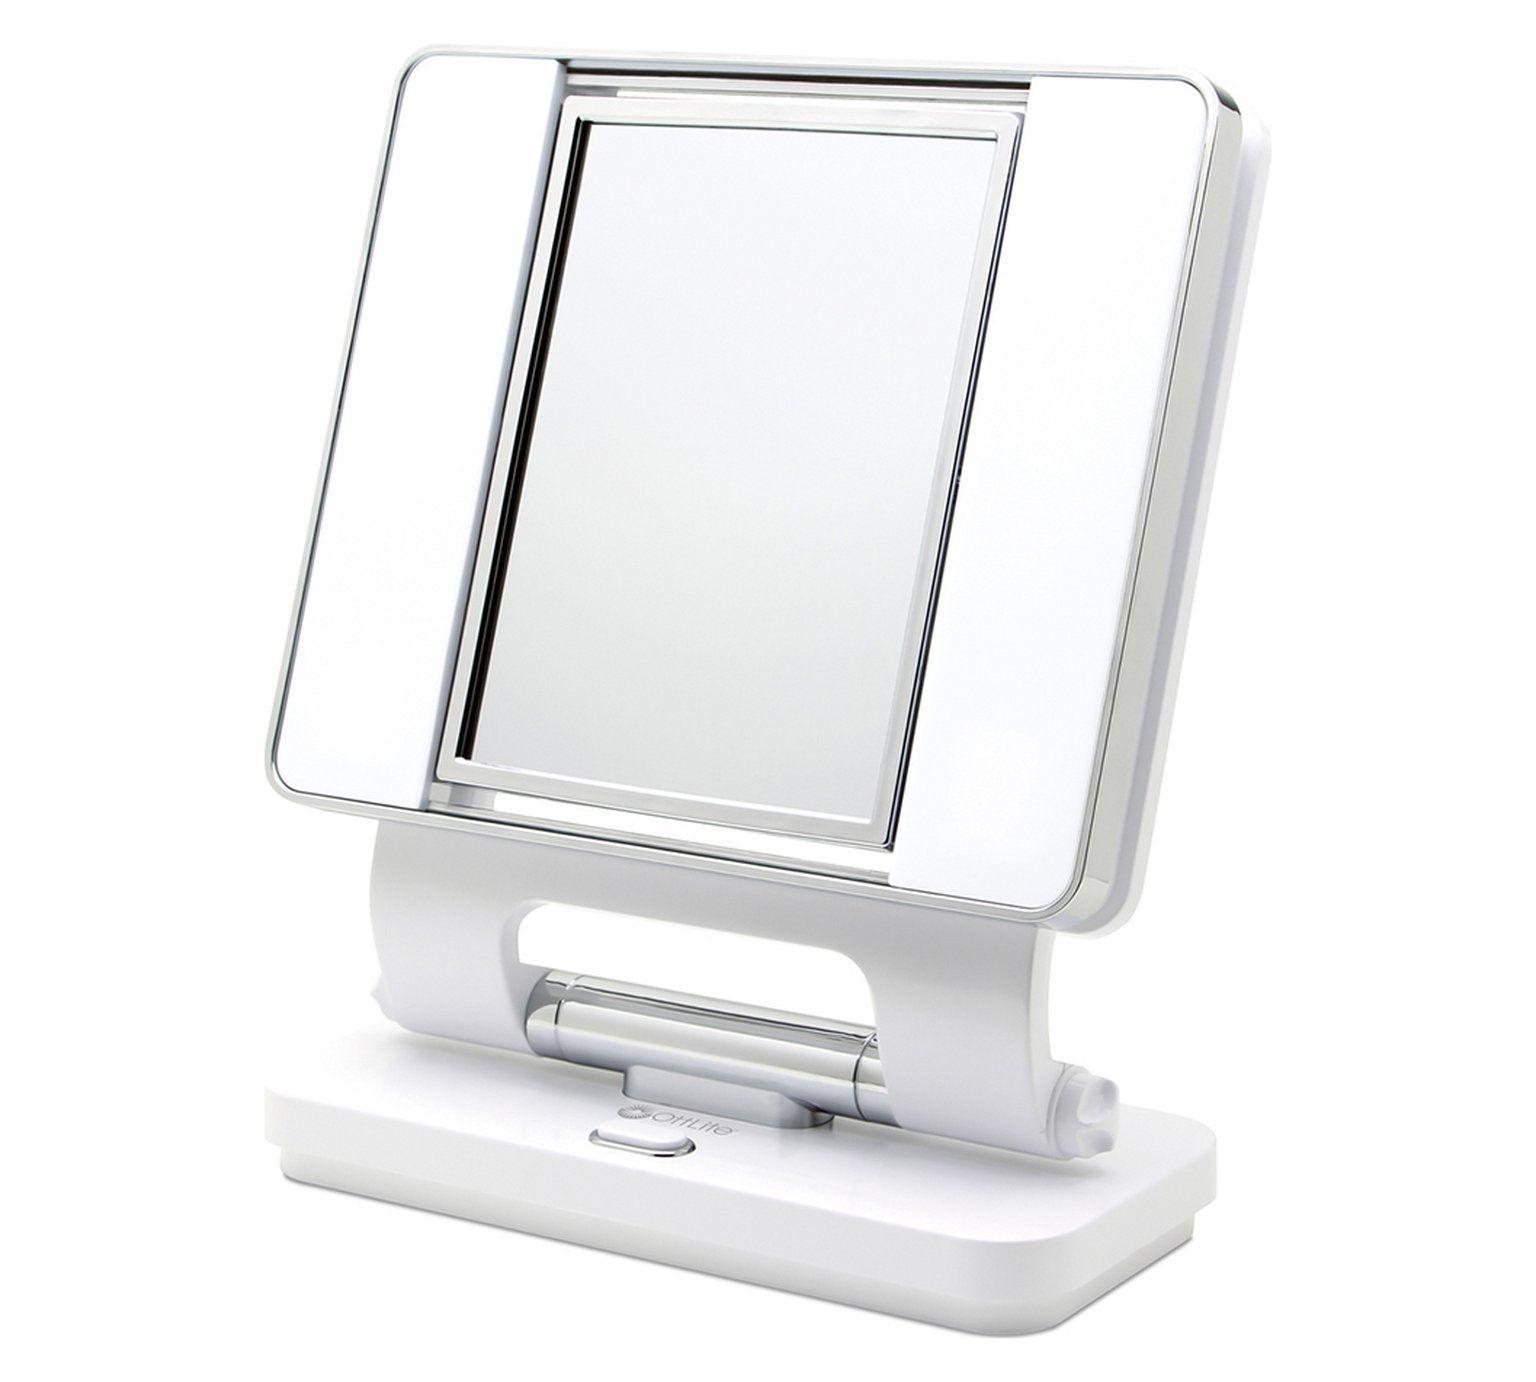 Ottlite Illuminated Natural Make Up Mirror Bathroom